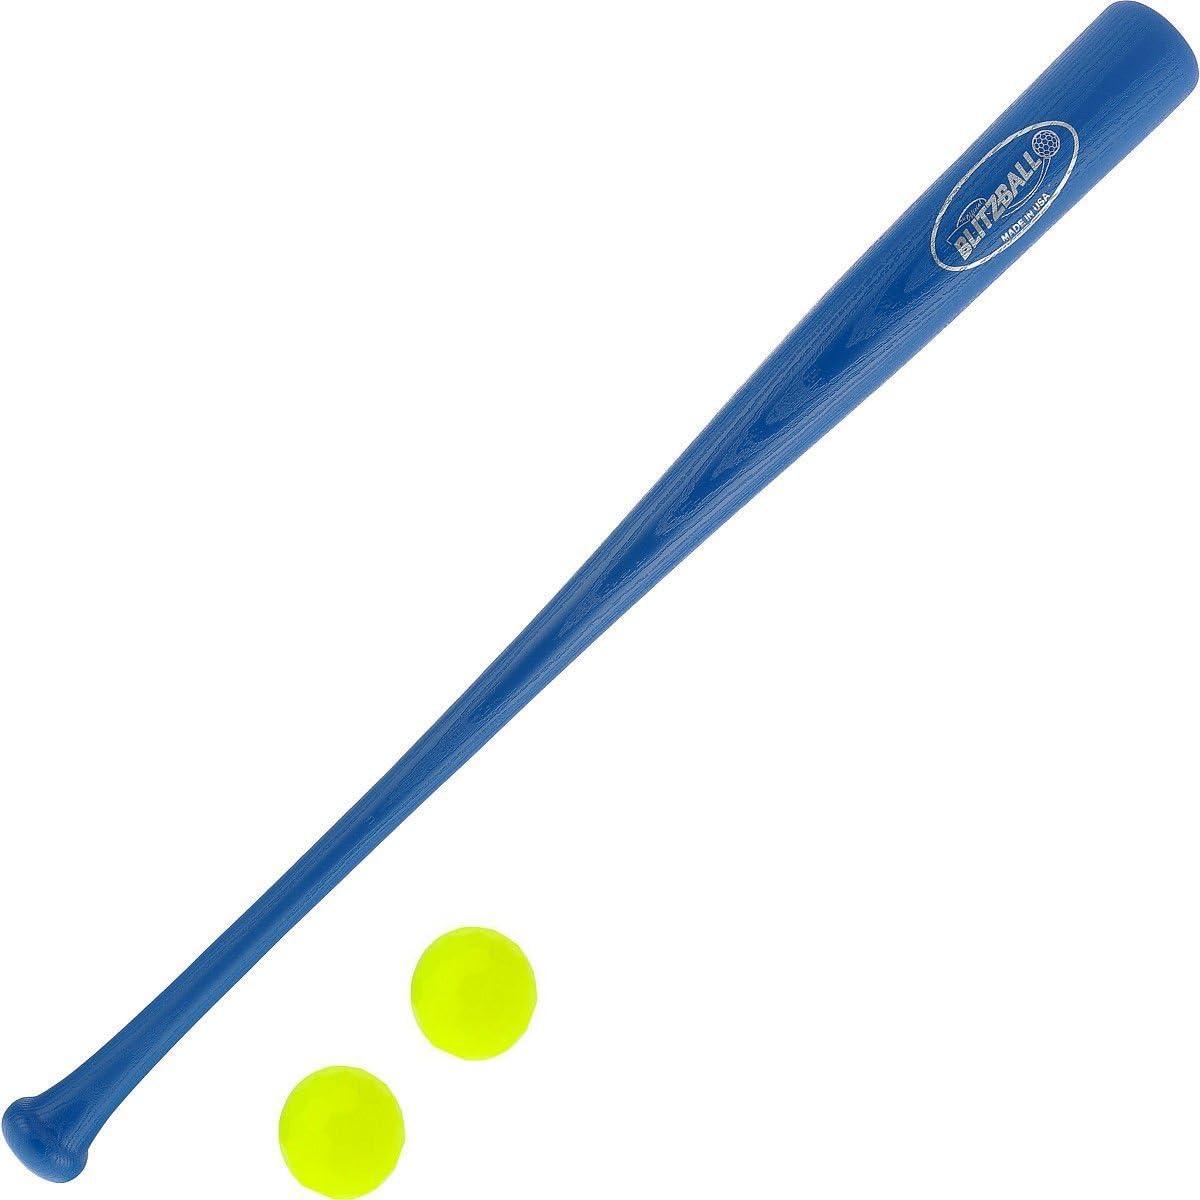 BLITZBALL Plastic Baseball and New Free Shipping Super sale period limited Bat Balls 2 Ball Set Combo